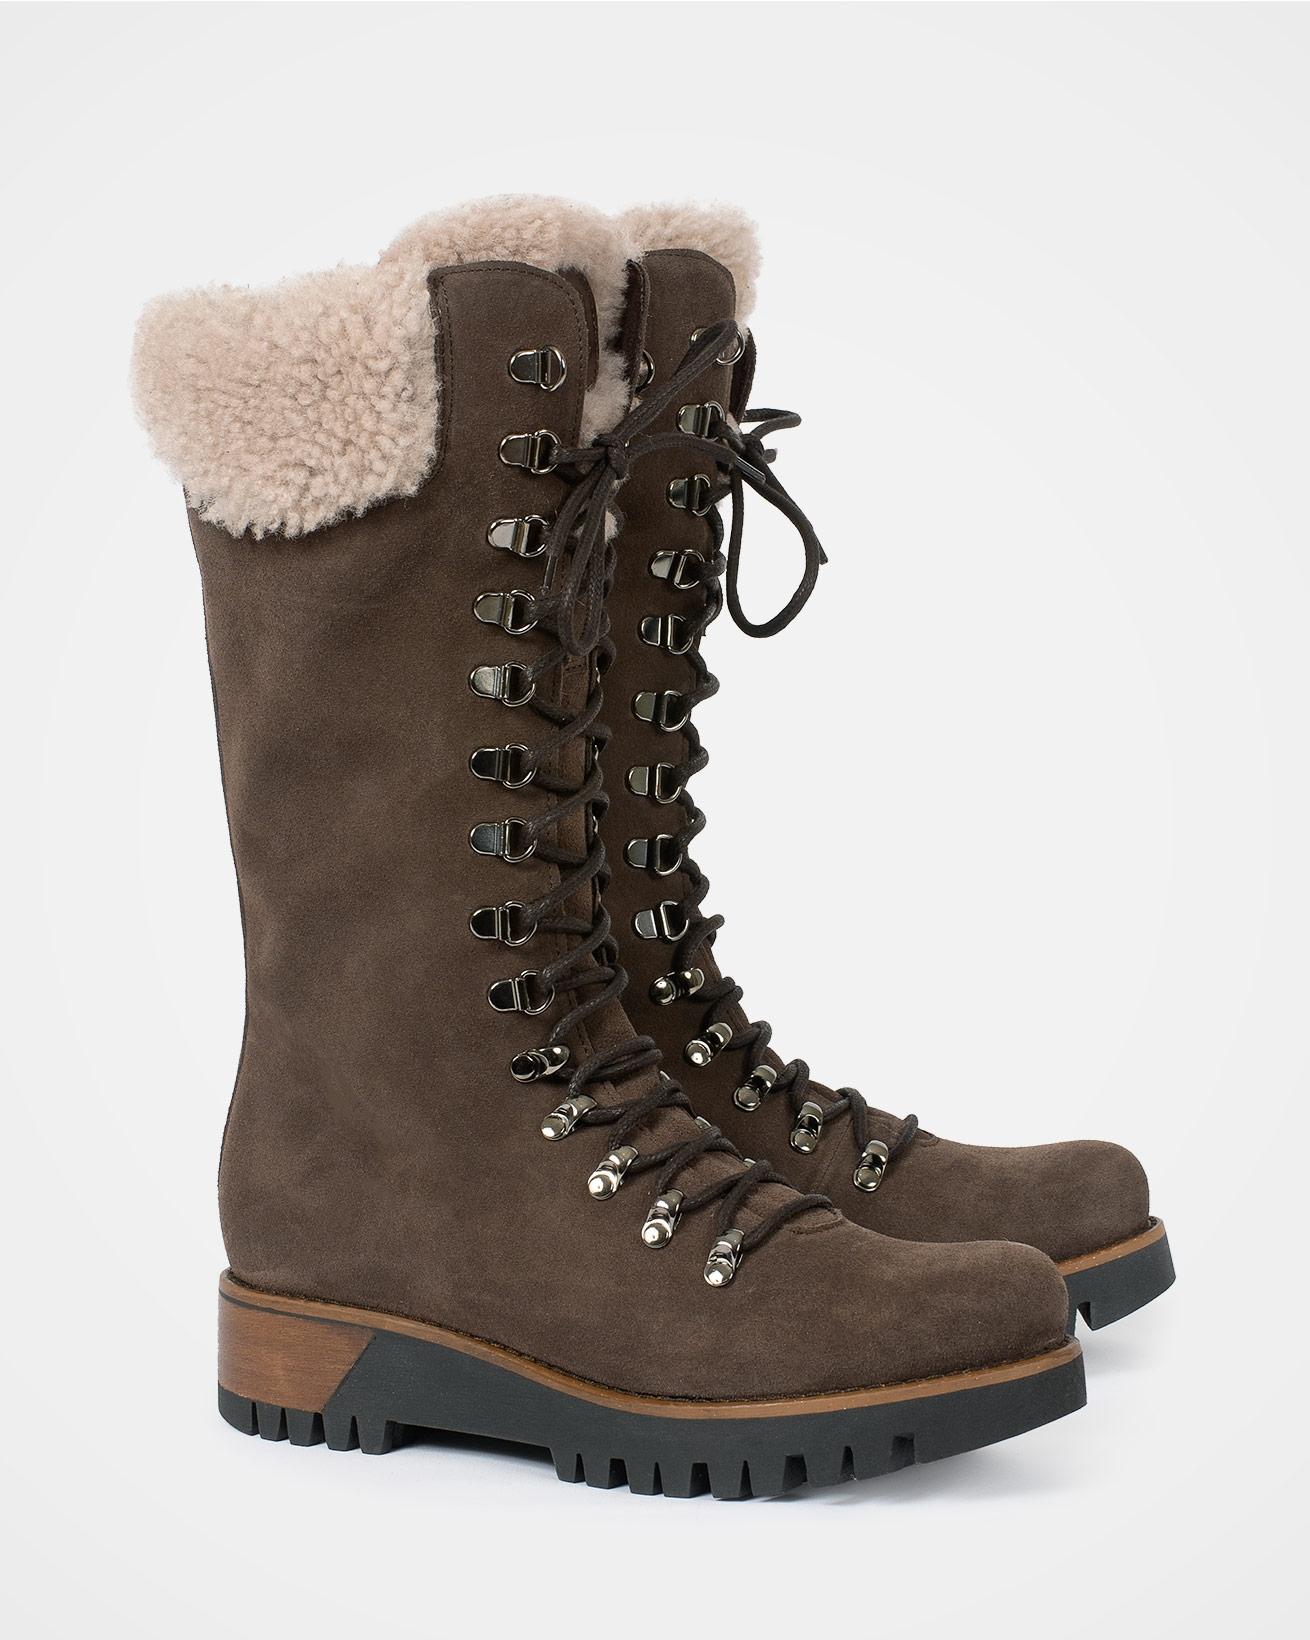 Icon Sheepskin Trim Wilderness Boots - Size 41 - Tanners brown - 2780